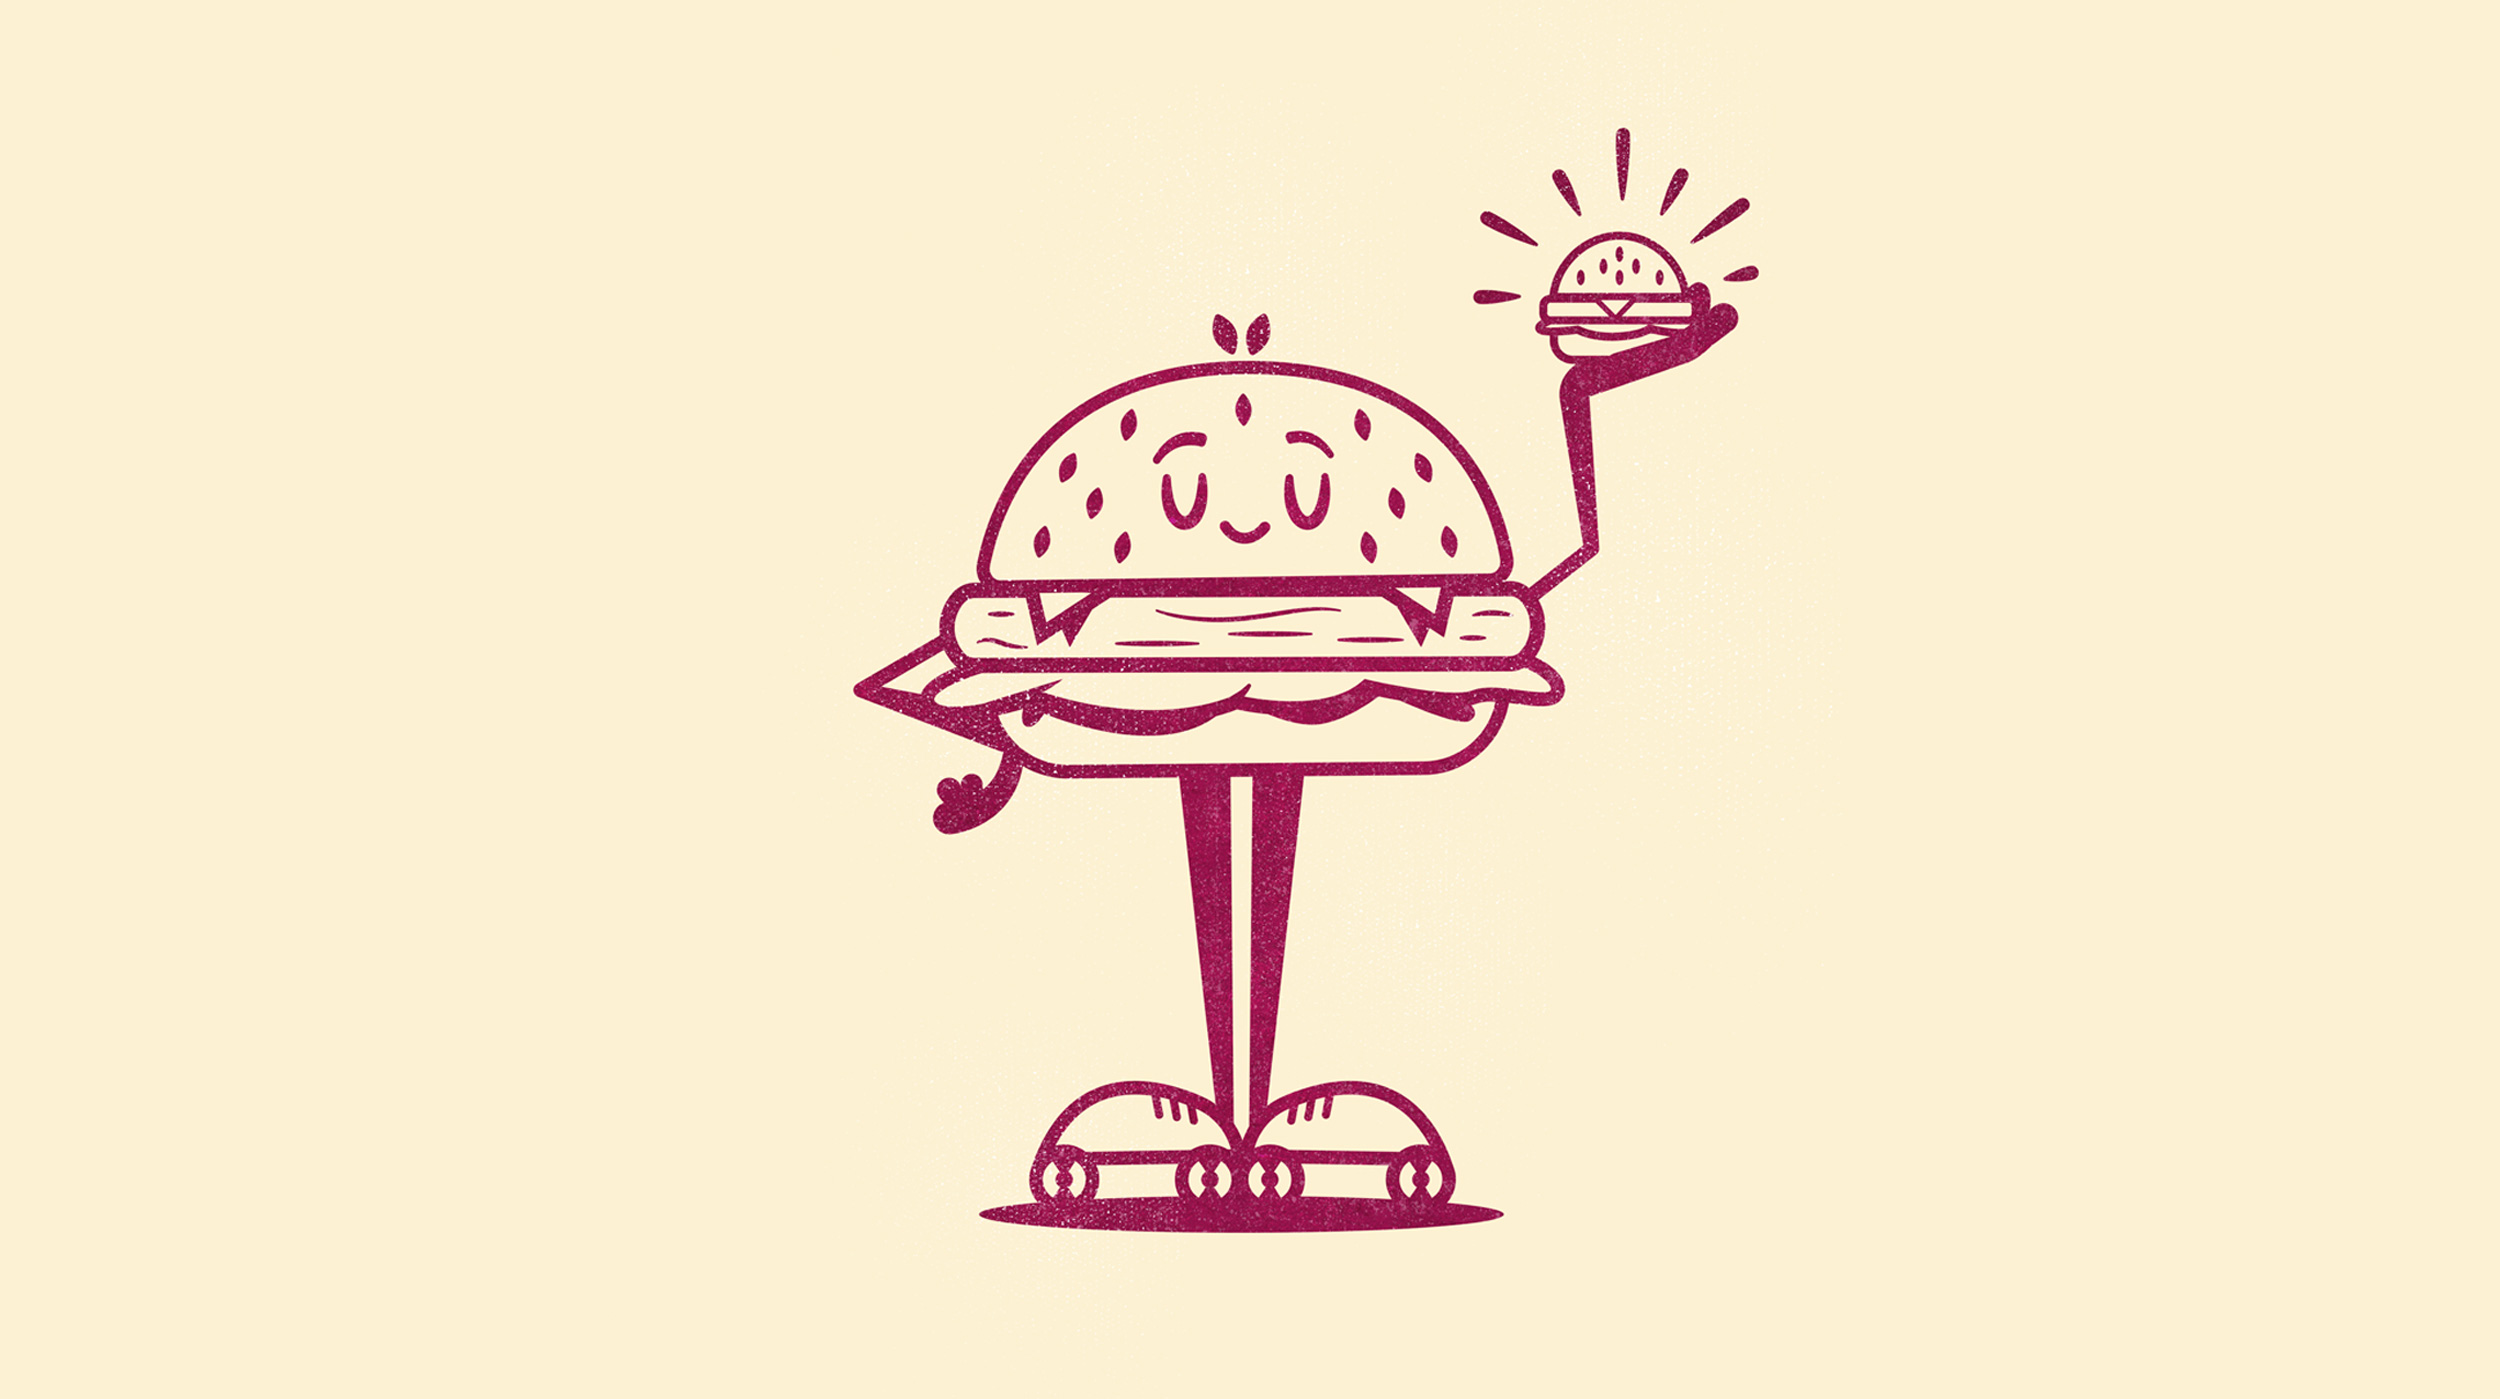 Eat-Goshen_Visuals_c1